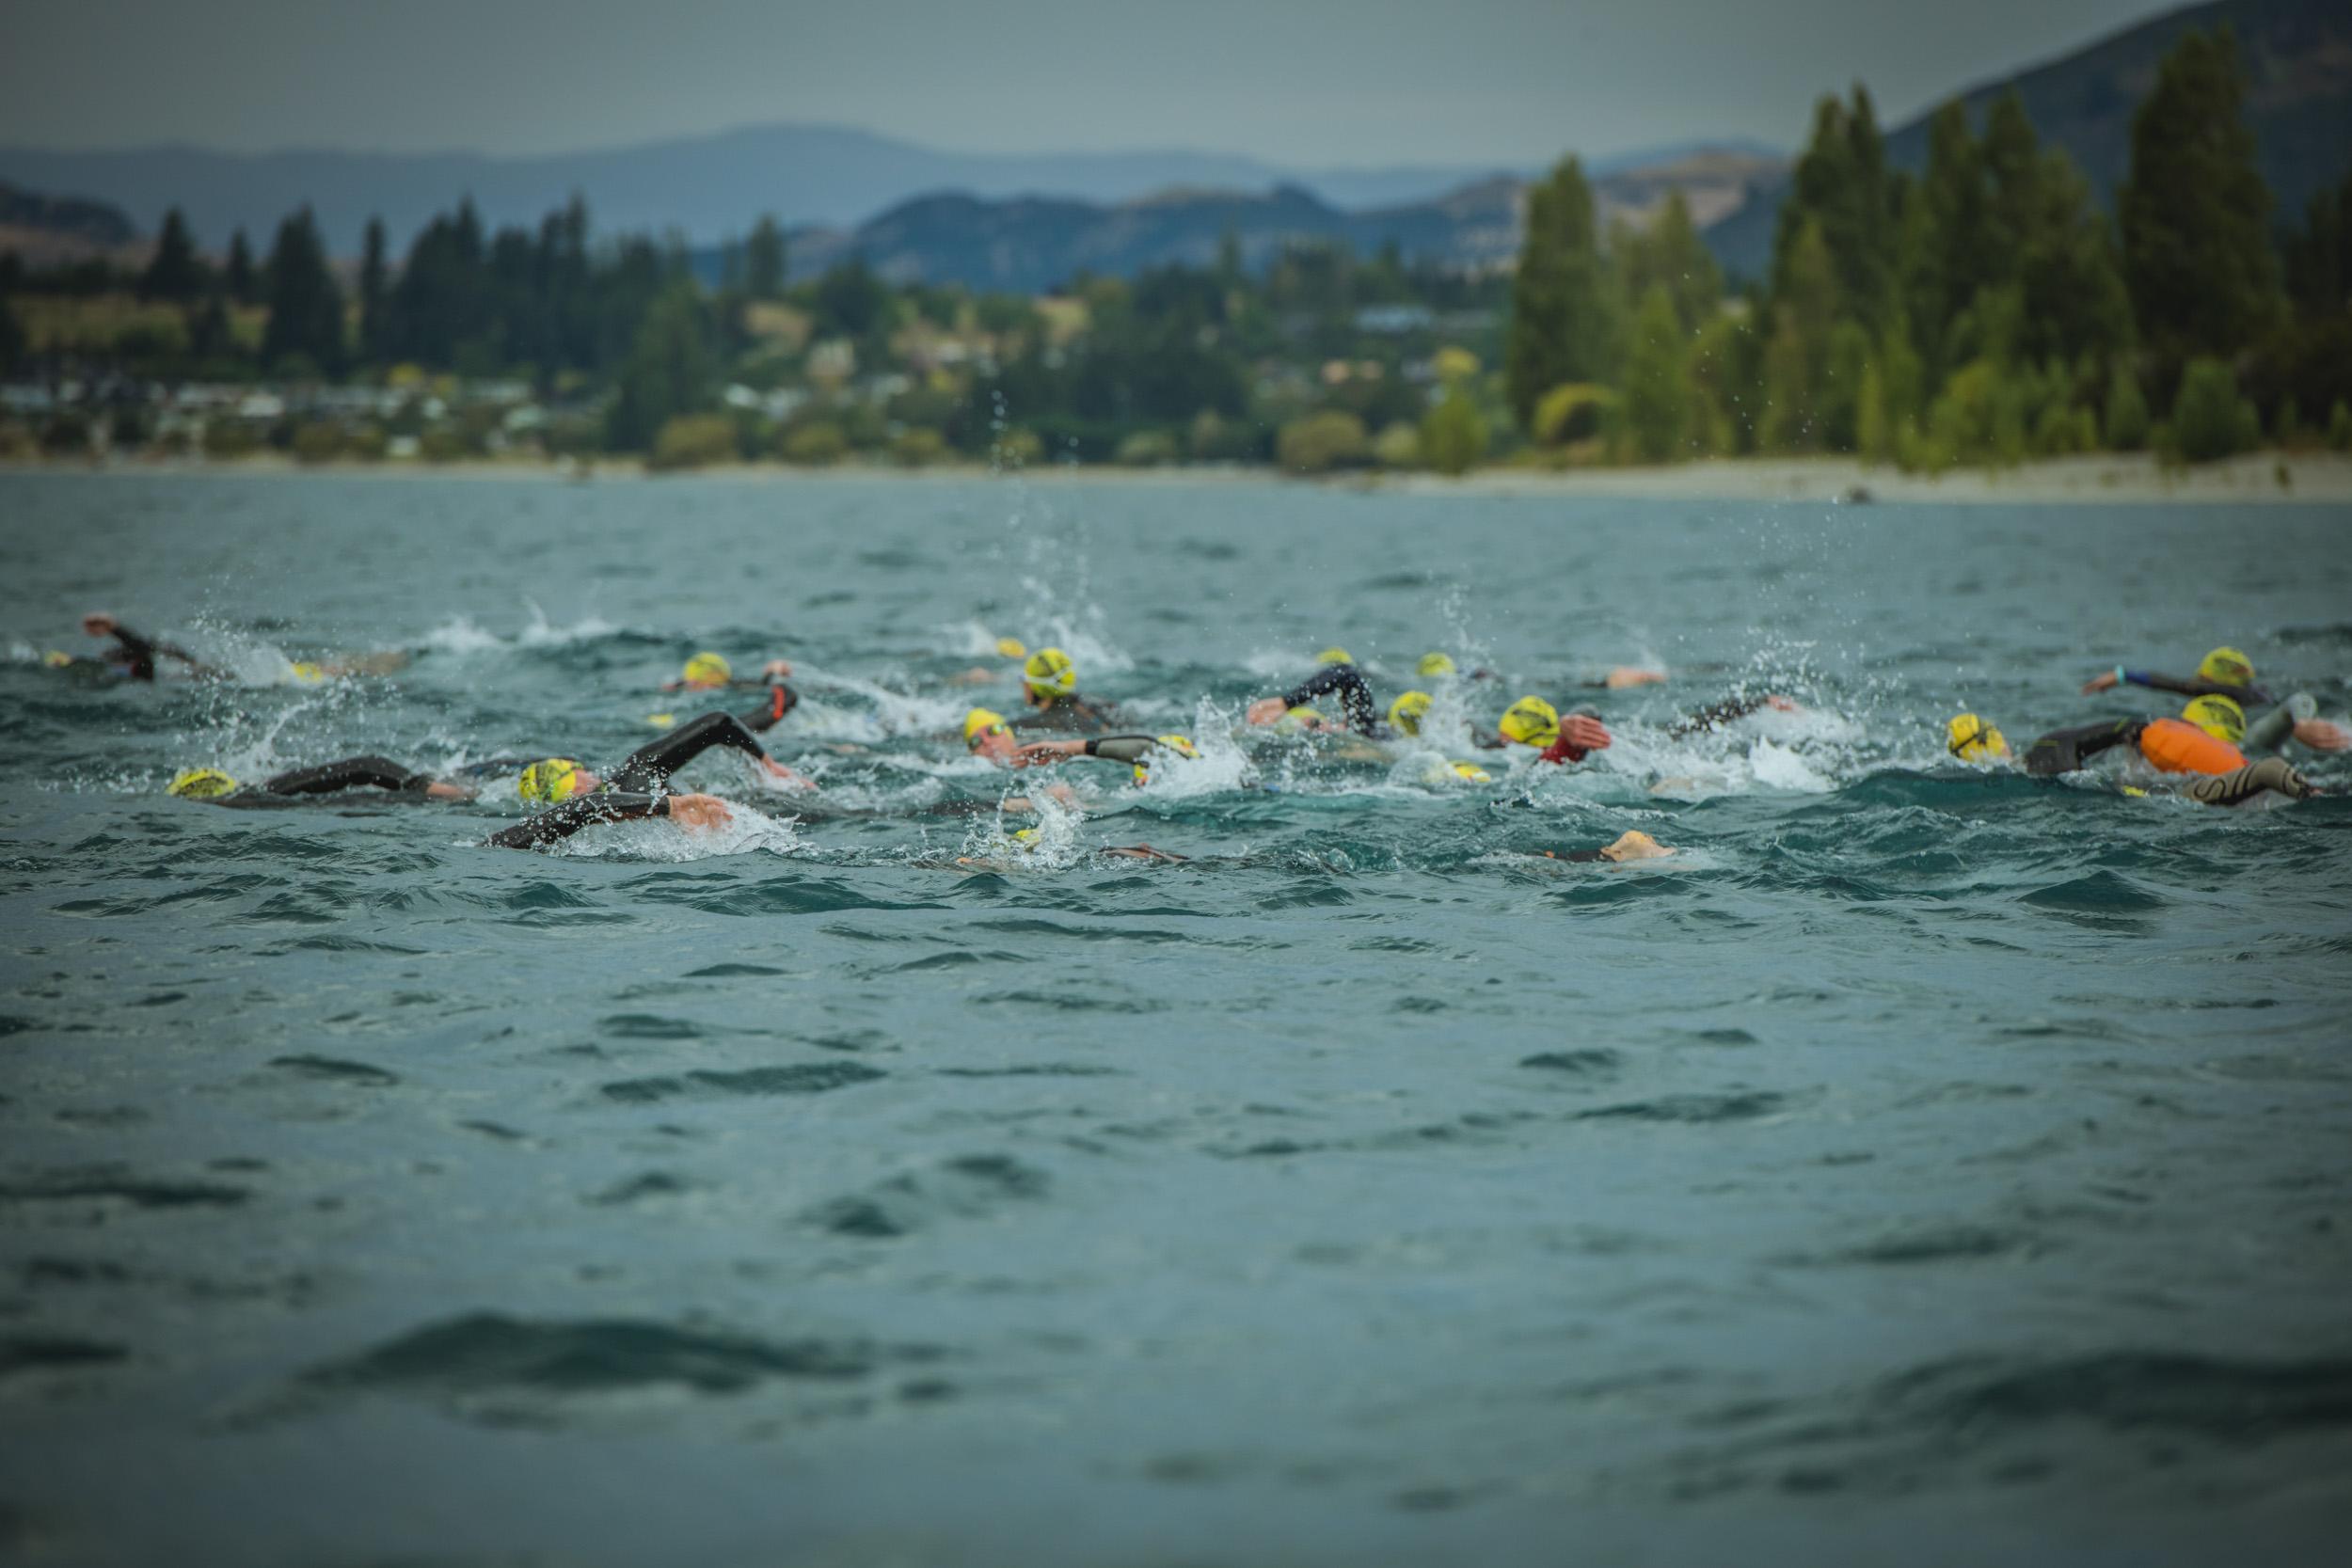 The foaming waters of Lake Wanaka